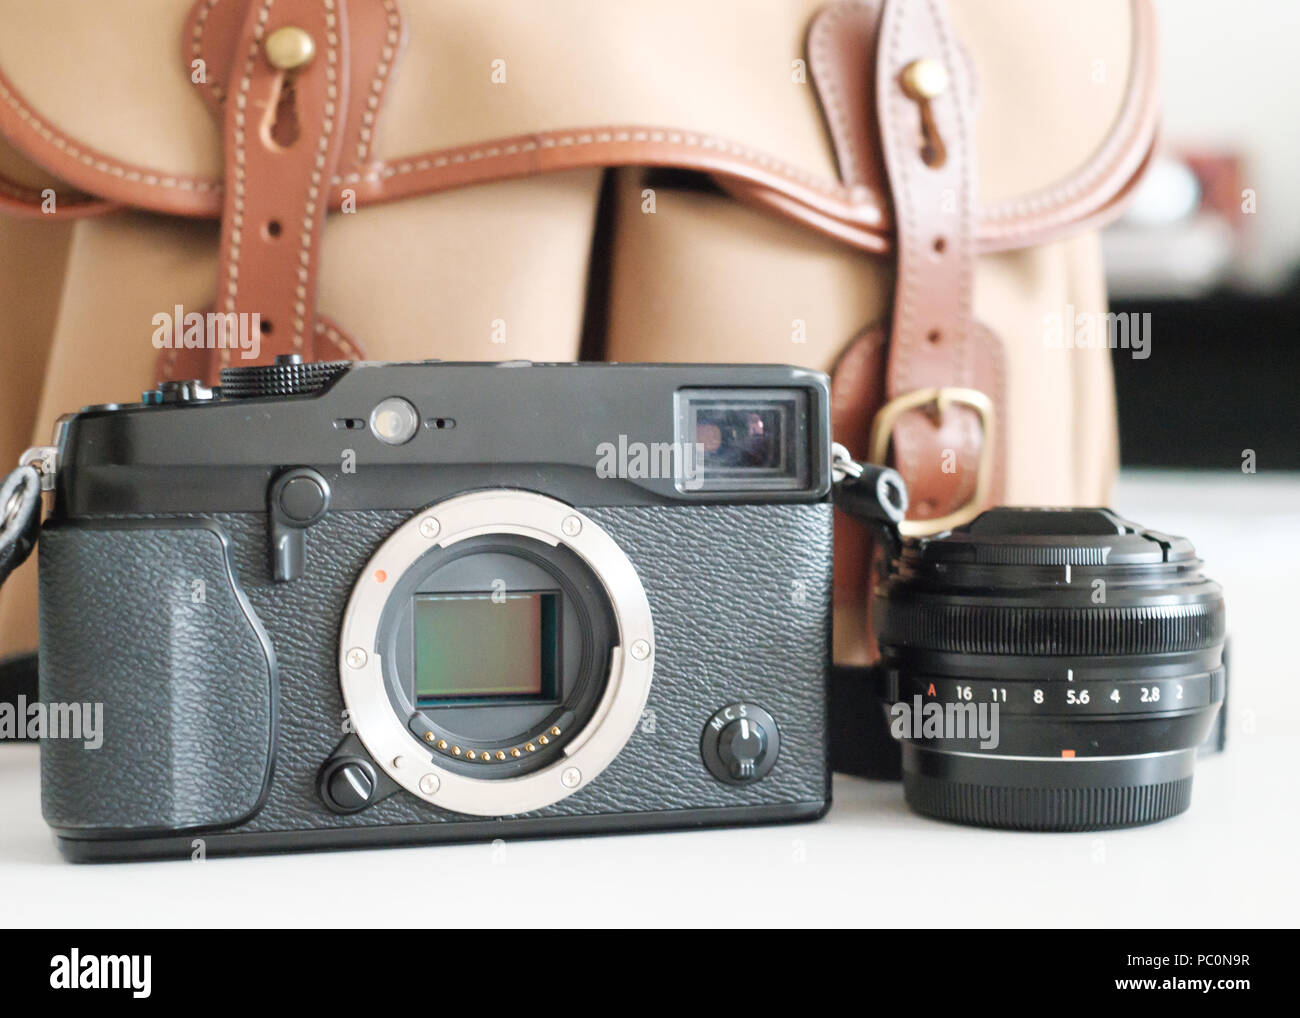 Fuji Mirrorless system camera with sensor visible, with lens and billingham camera bag Stock Photo